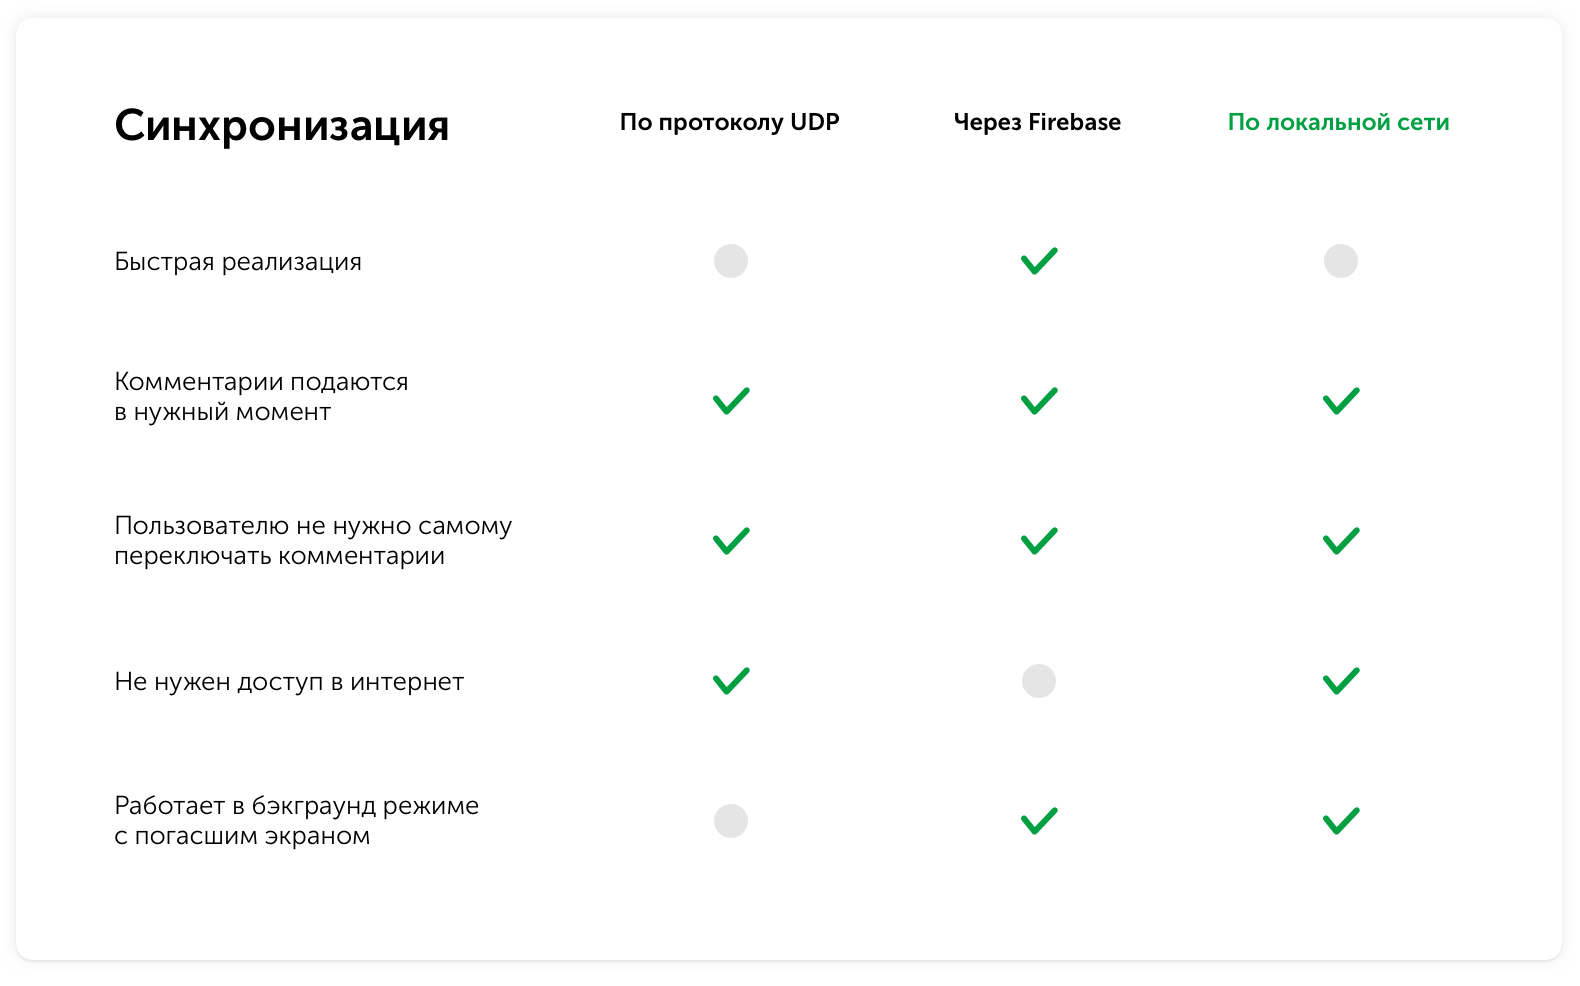 Дизайн tutu.ru ios